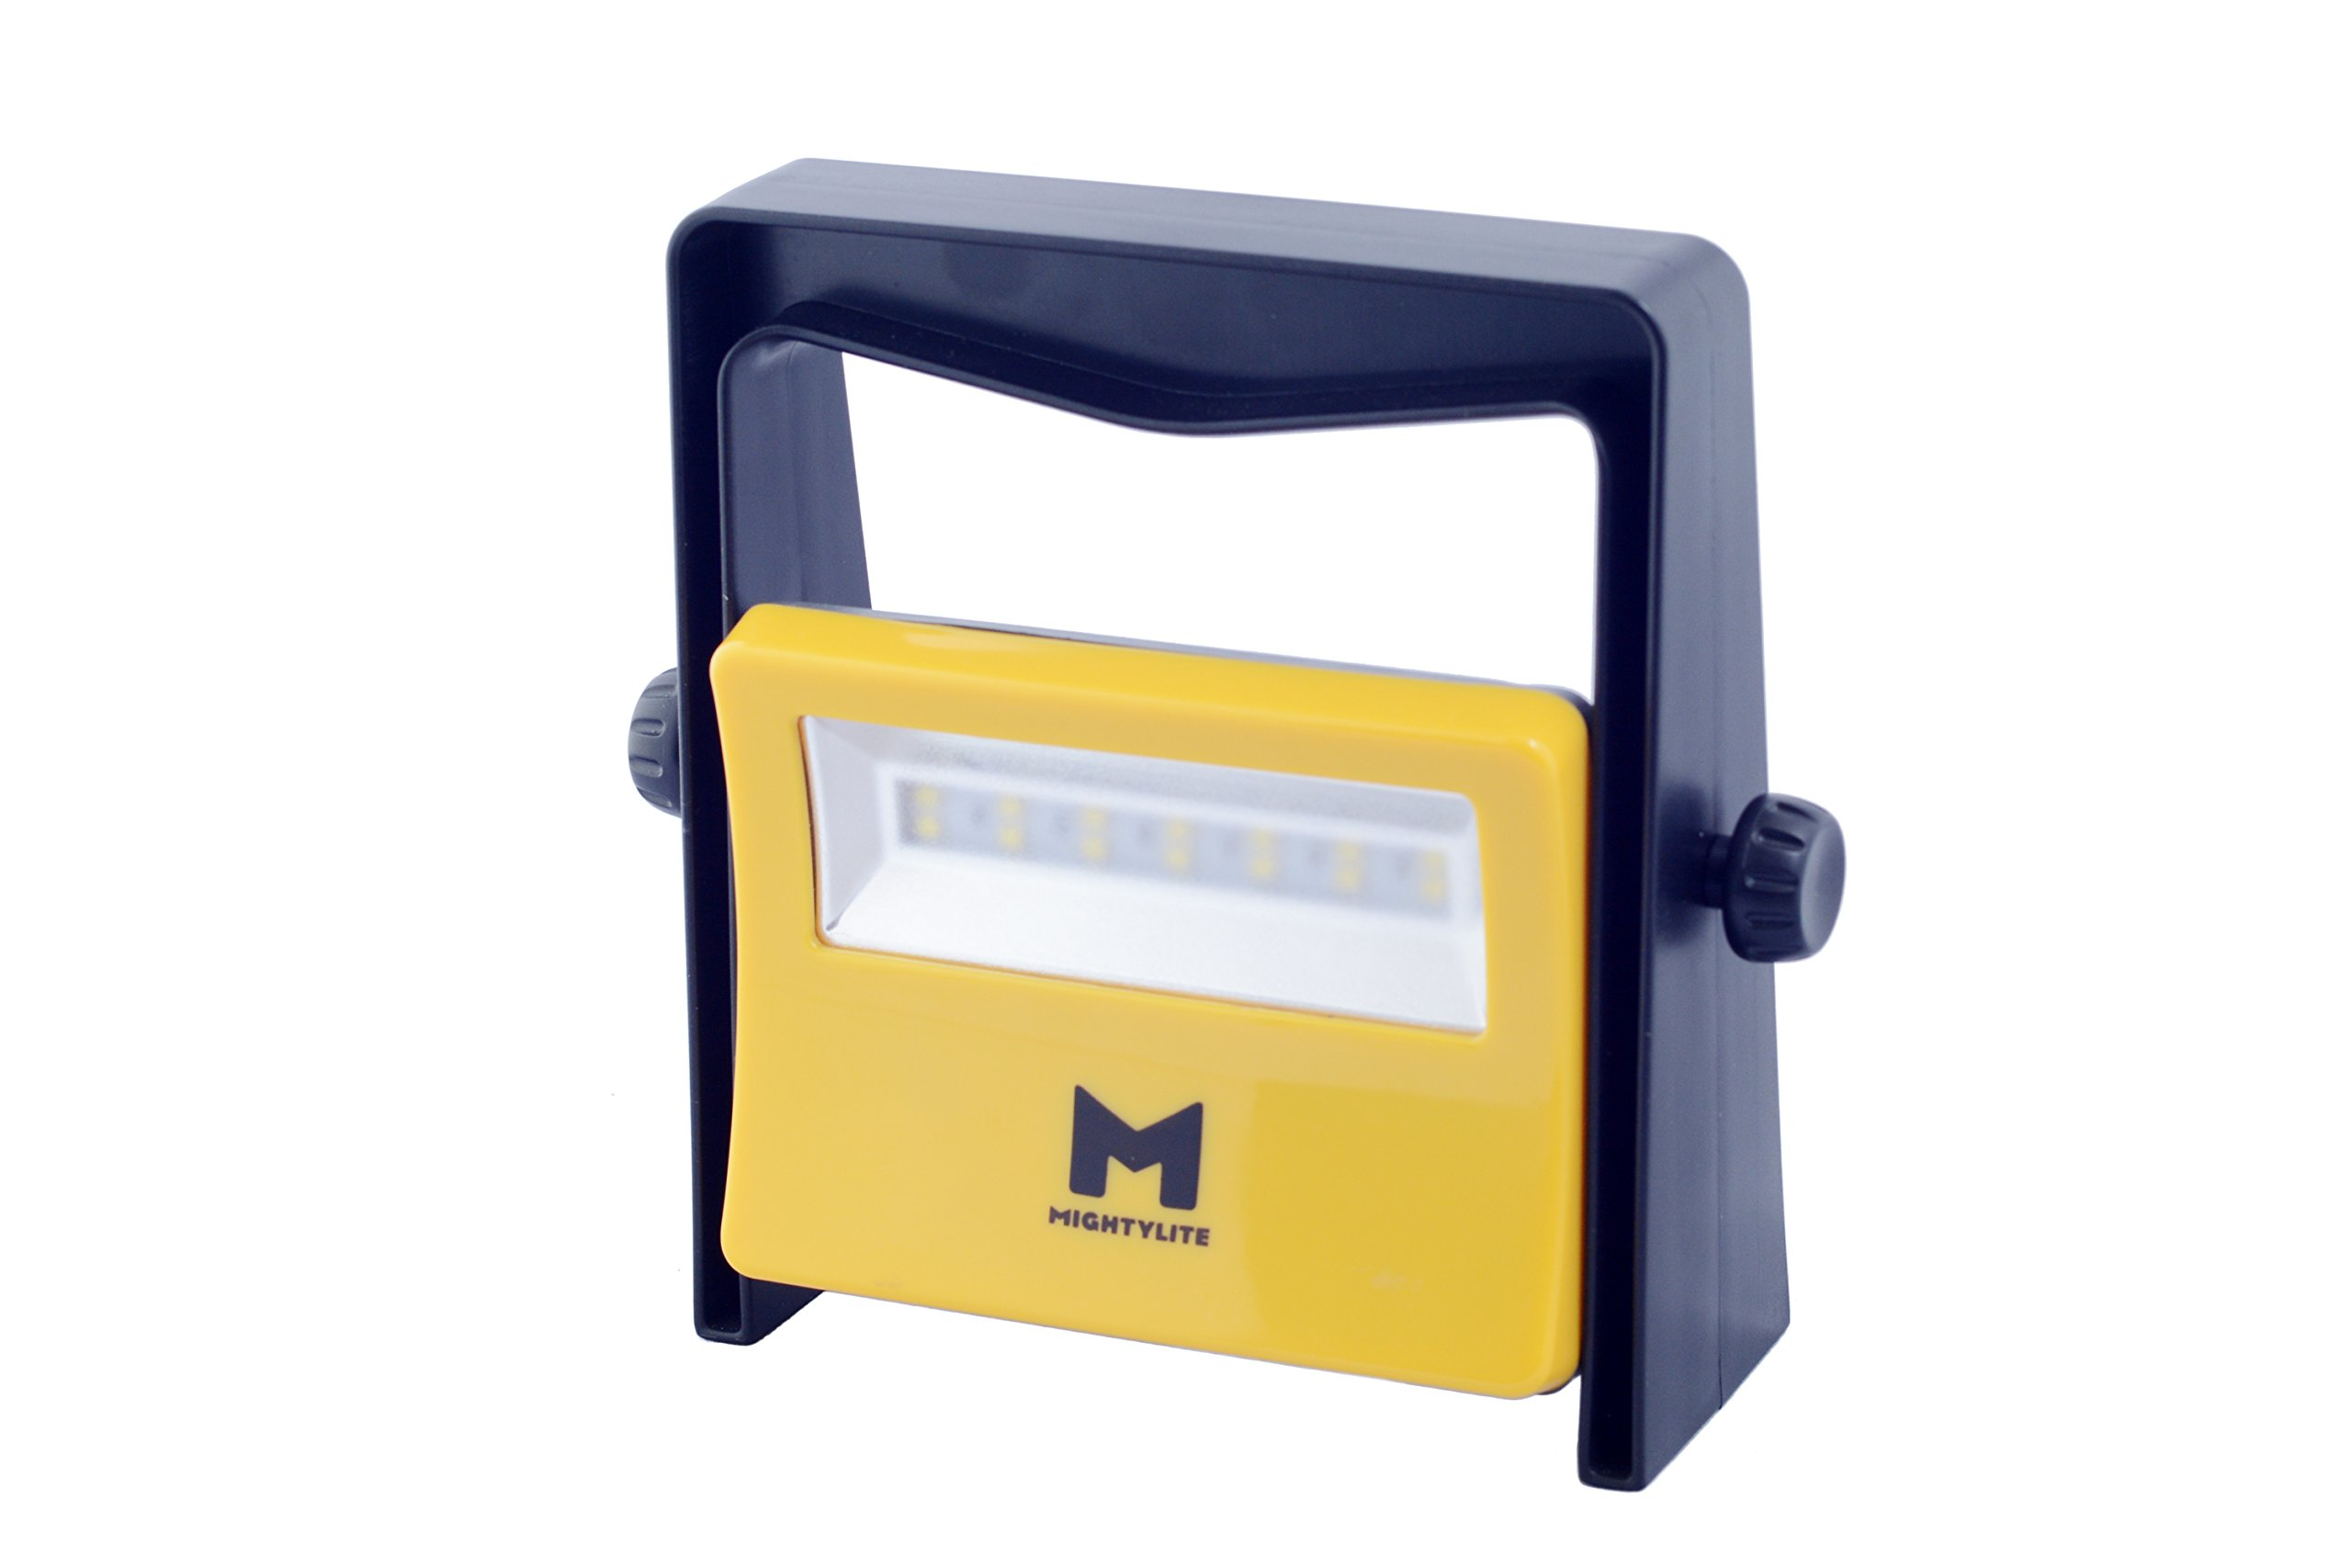 MightyLite Series II, [8W 14LED] Portable Outdoor Work Light - 600 Lumen 50,000 Hour Lifespan - Industrial Grade Polycarbonate & Aluminum Housing, Drop-Resistant, Ultra Durable Compact Flood Light